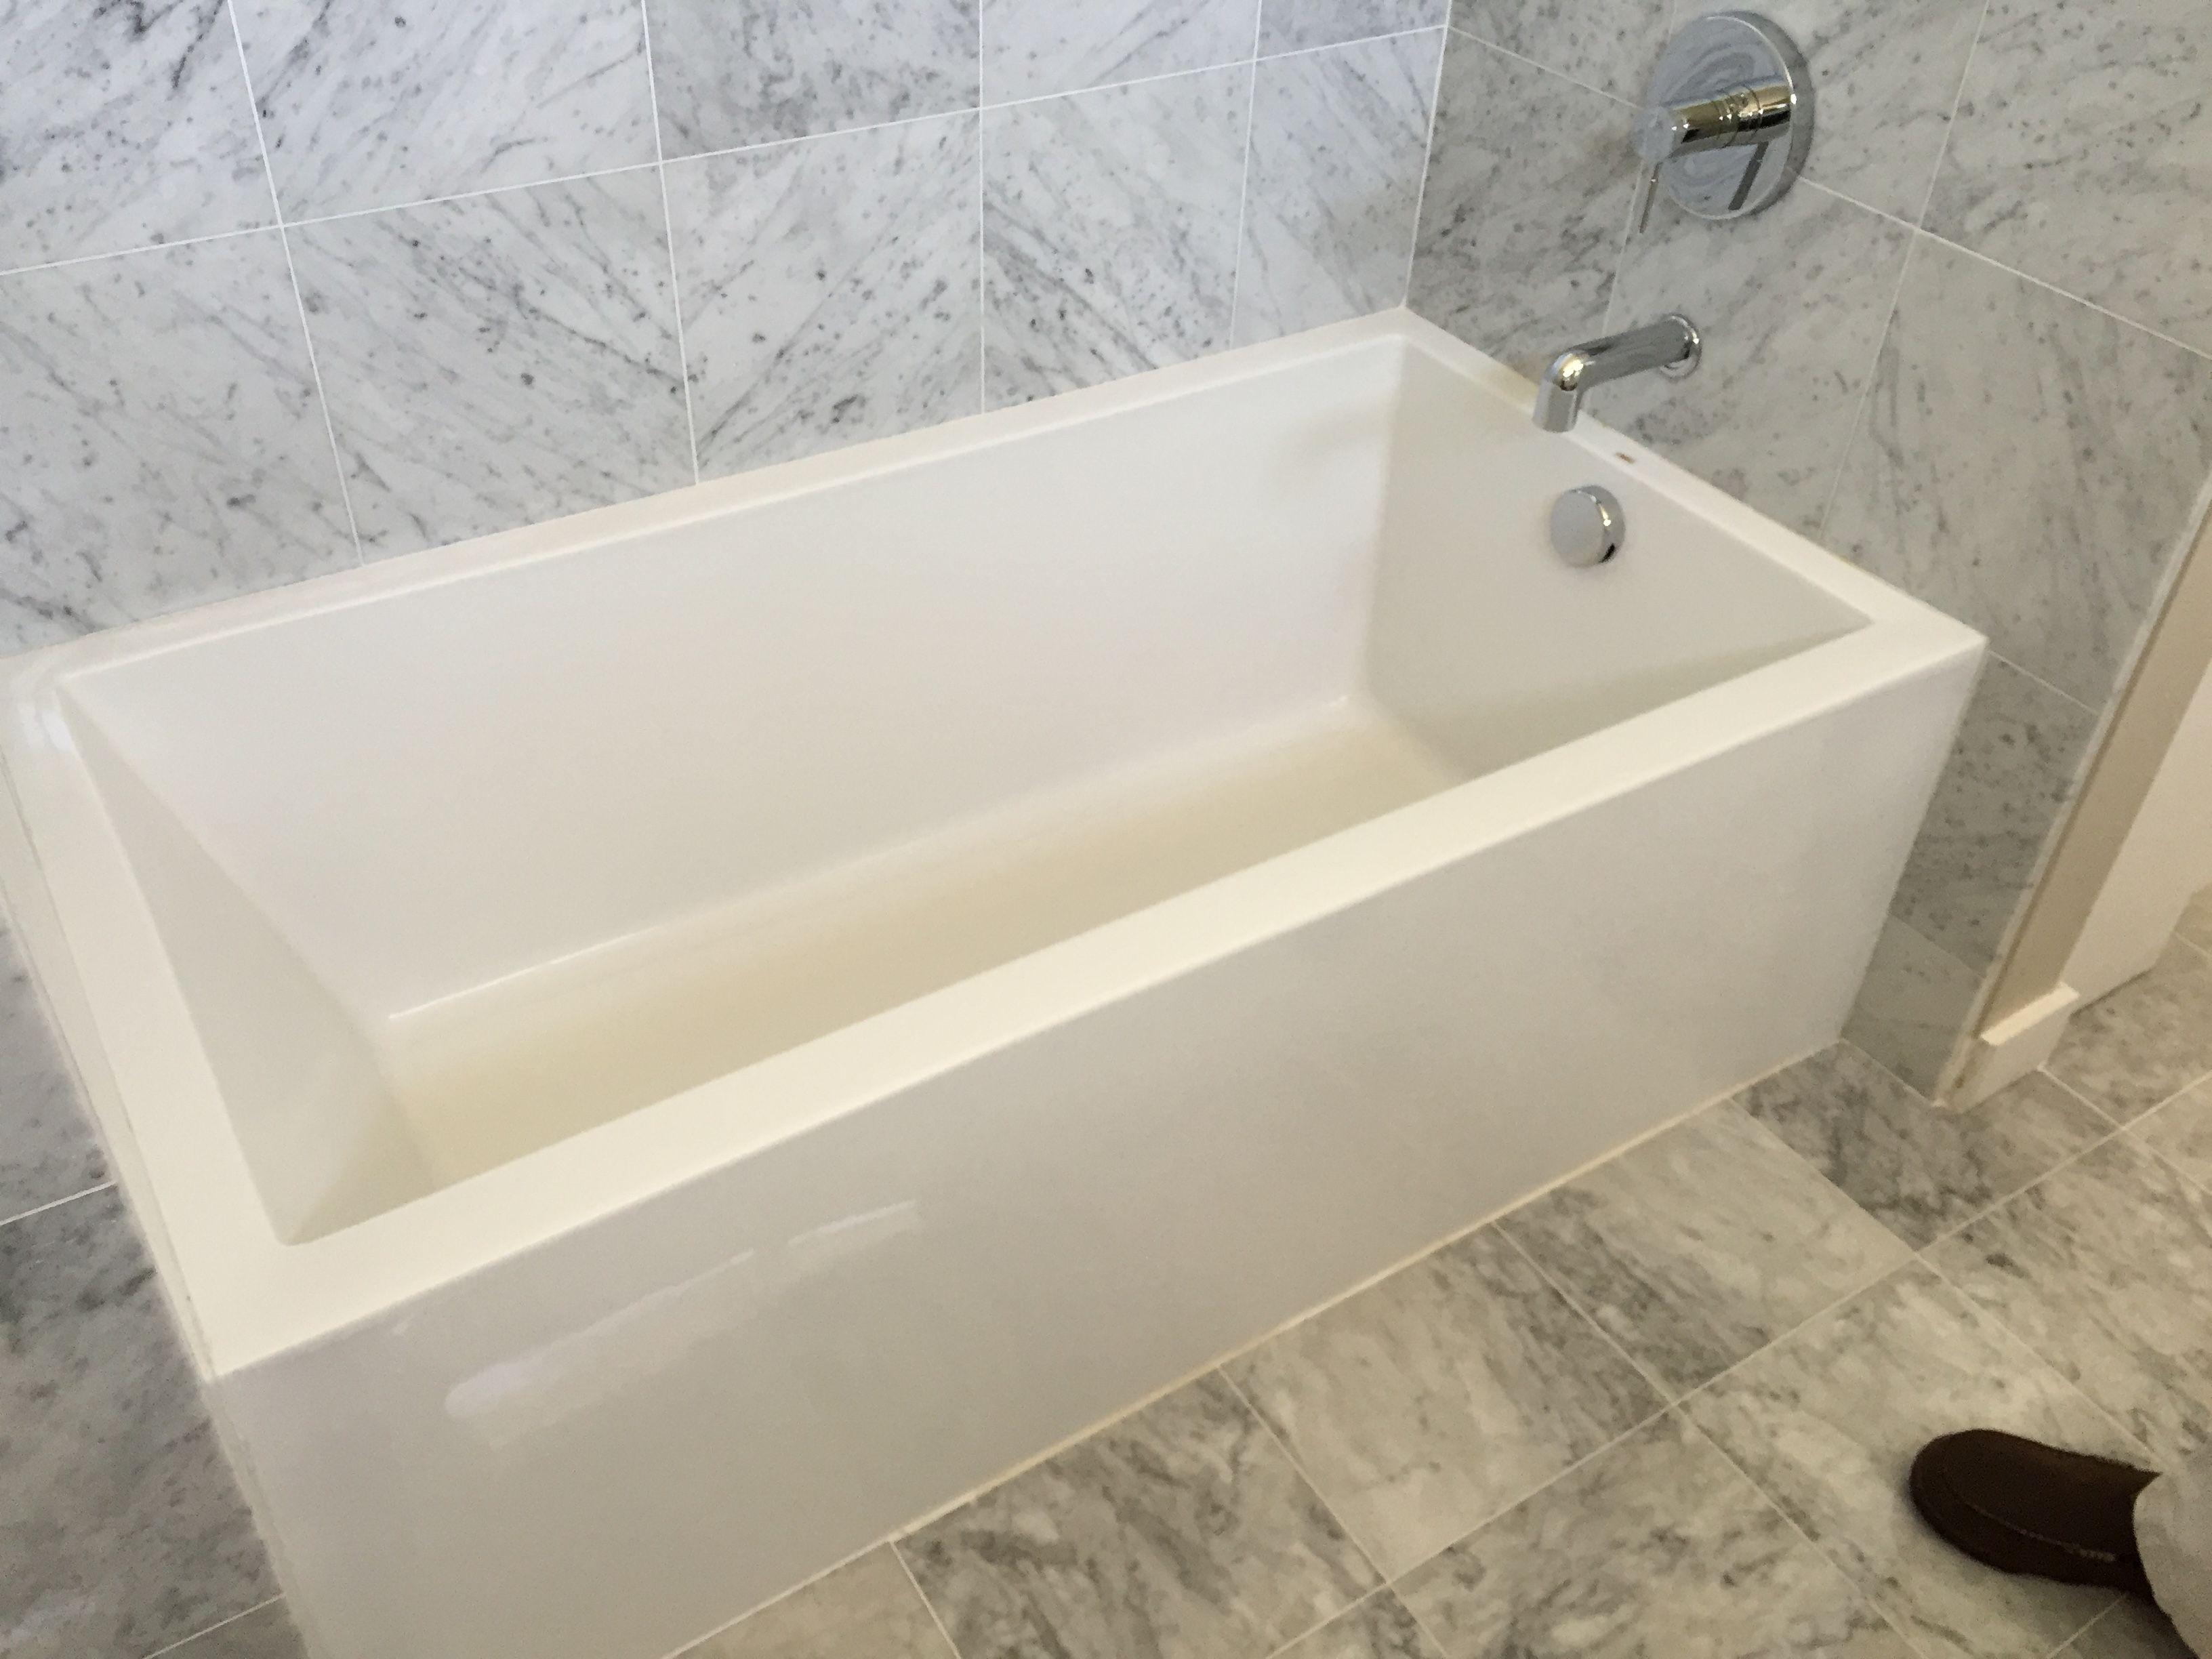 mirabelle bathtub tub diagonal standard reviews albert edenton victoria fish tubs soaking dimensions soaker